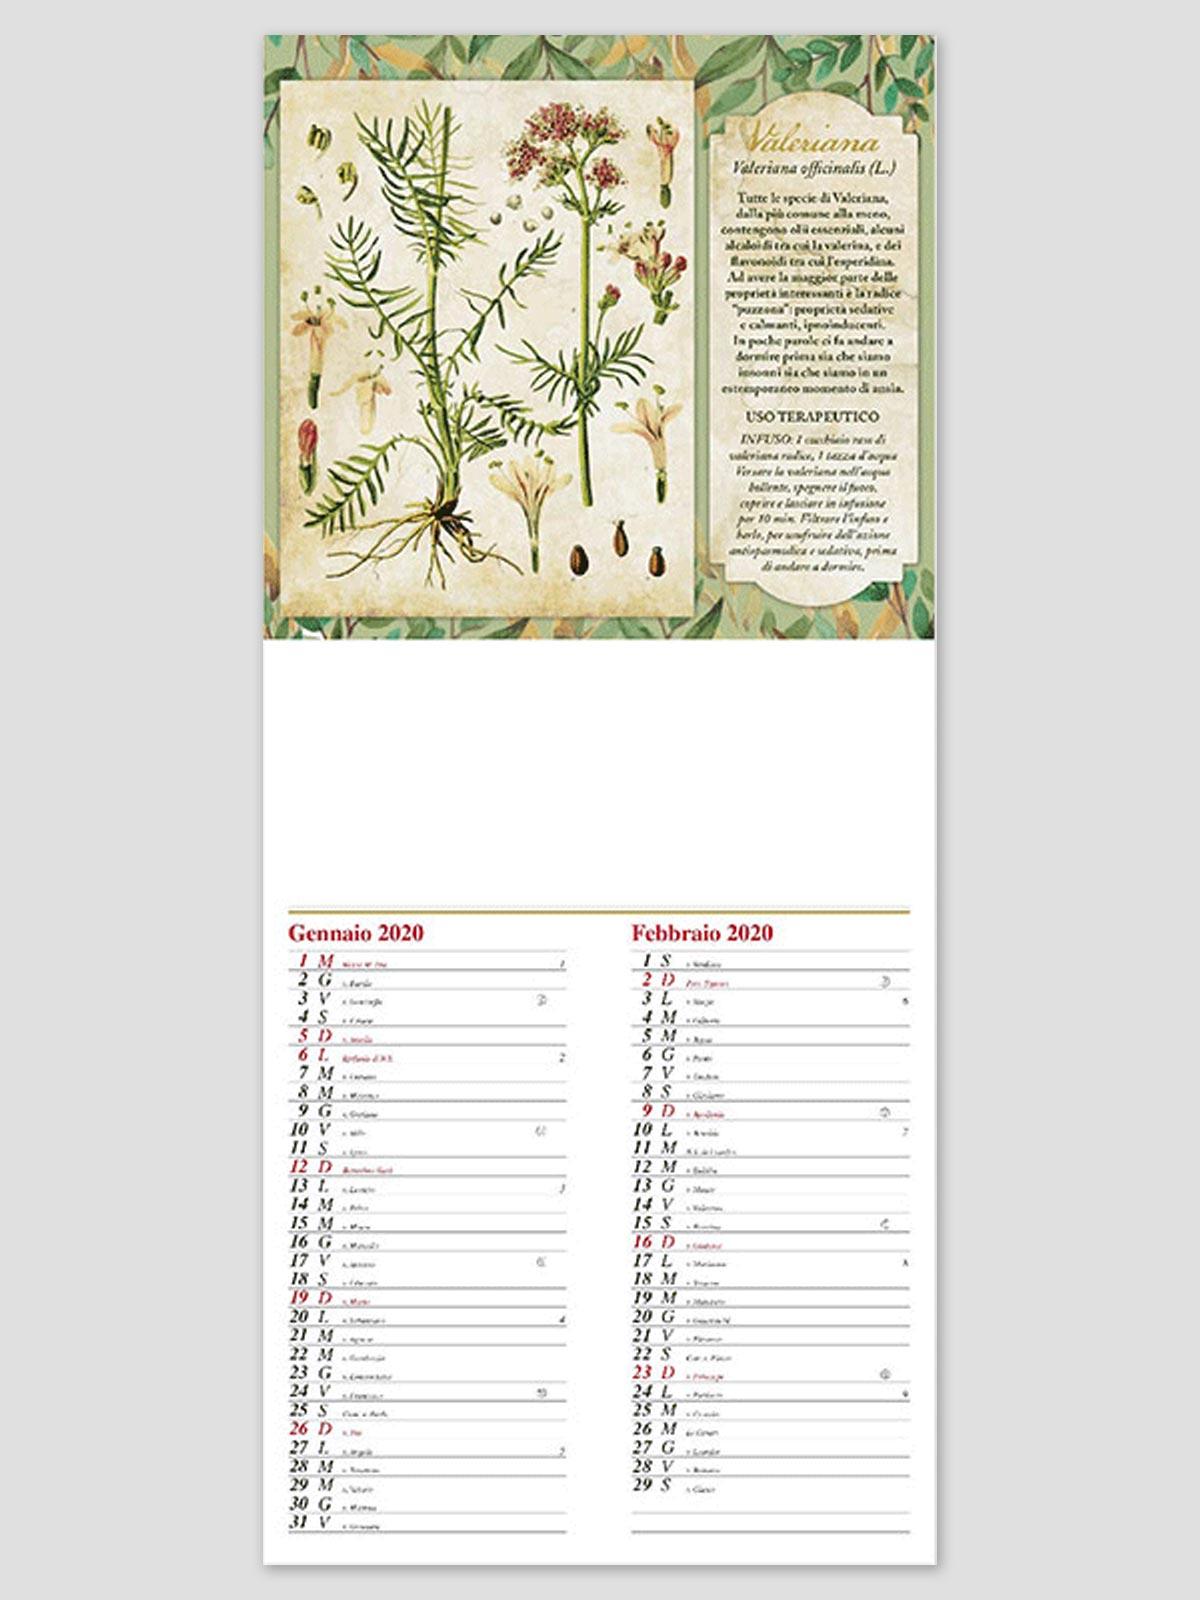 Calendario Aste Trani.Calendario Illustrato Art 904 Giove Erbario Cm 21 5x49